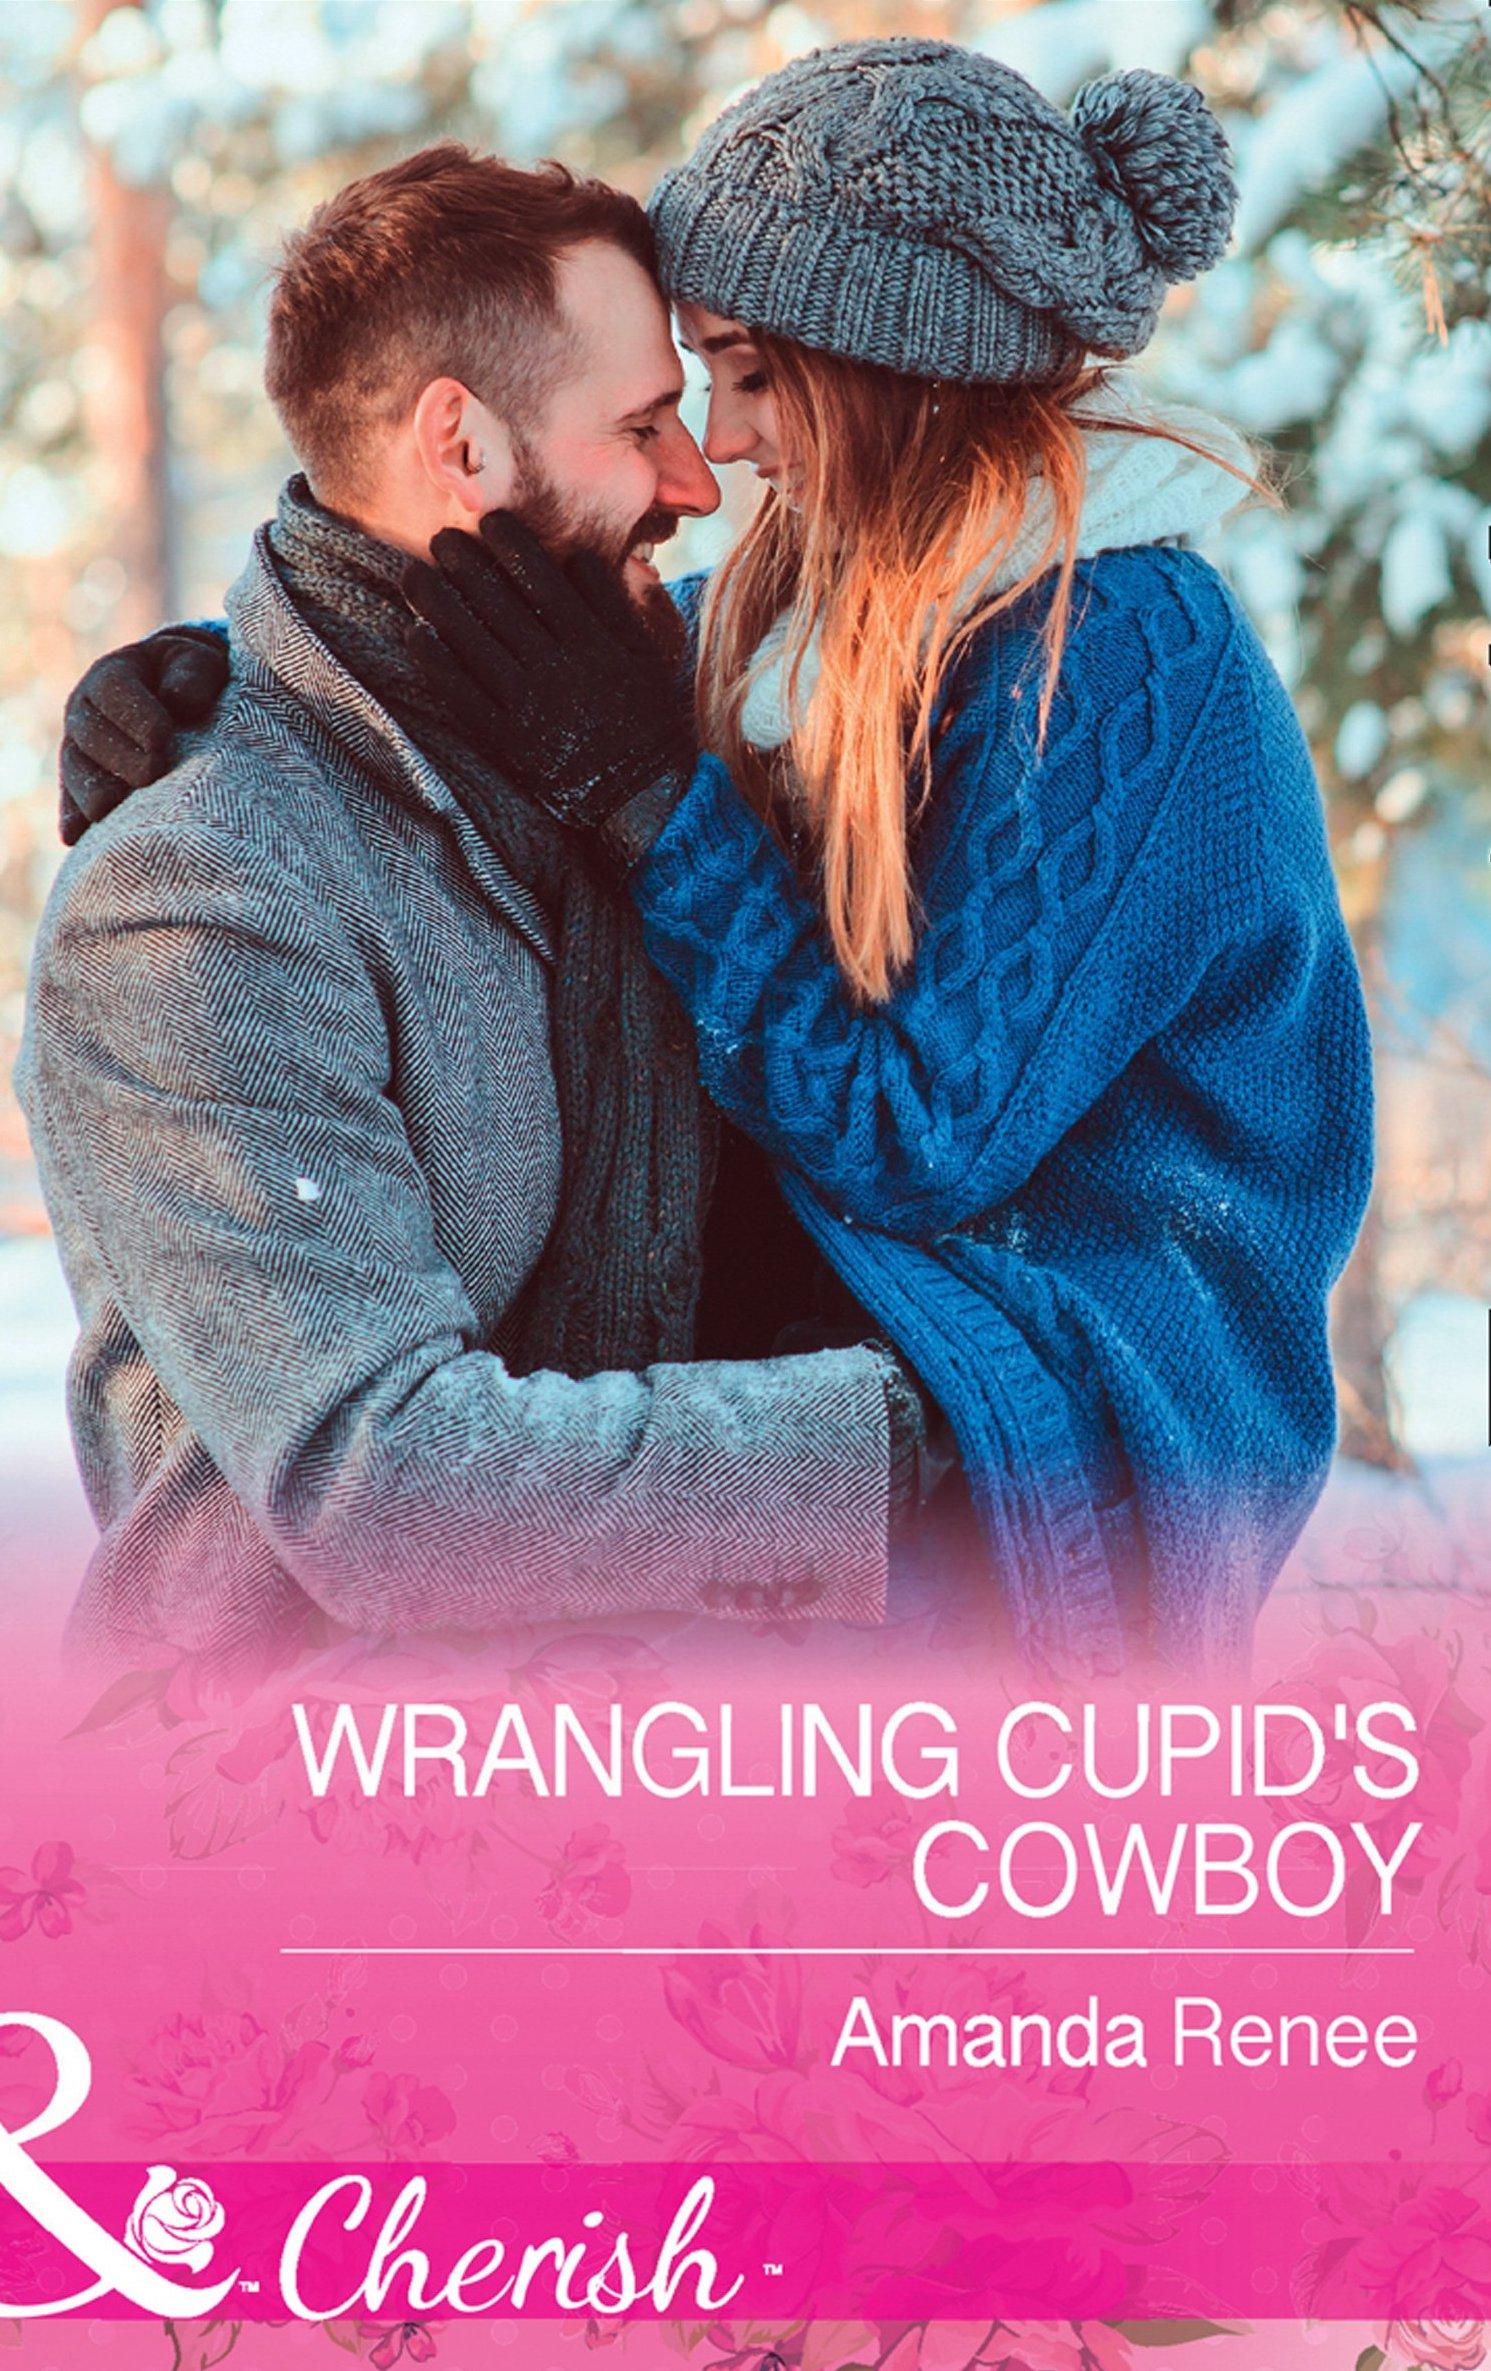 Wrangling Cupid's Cowboy